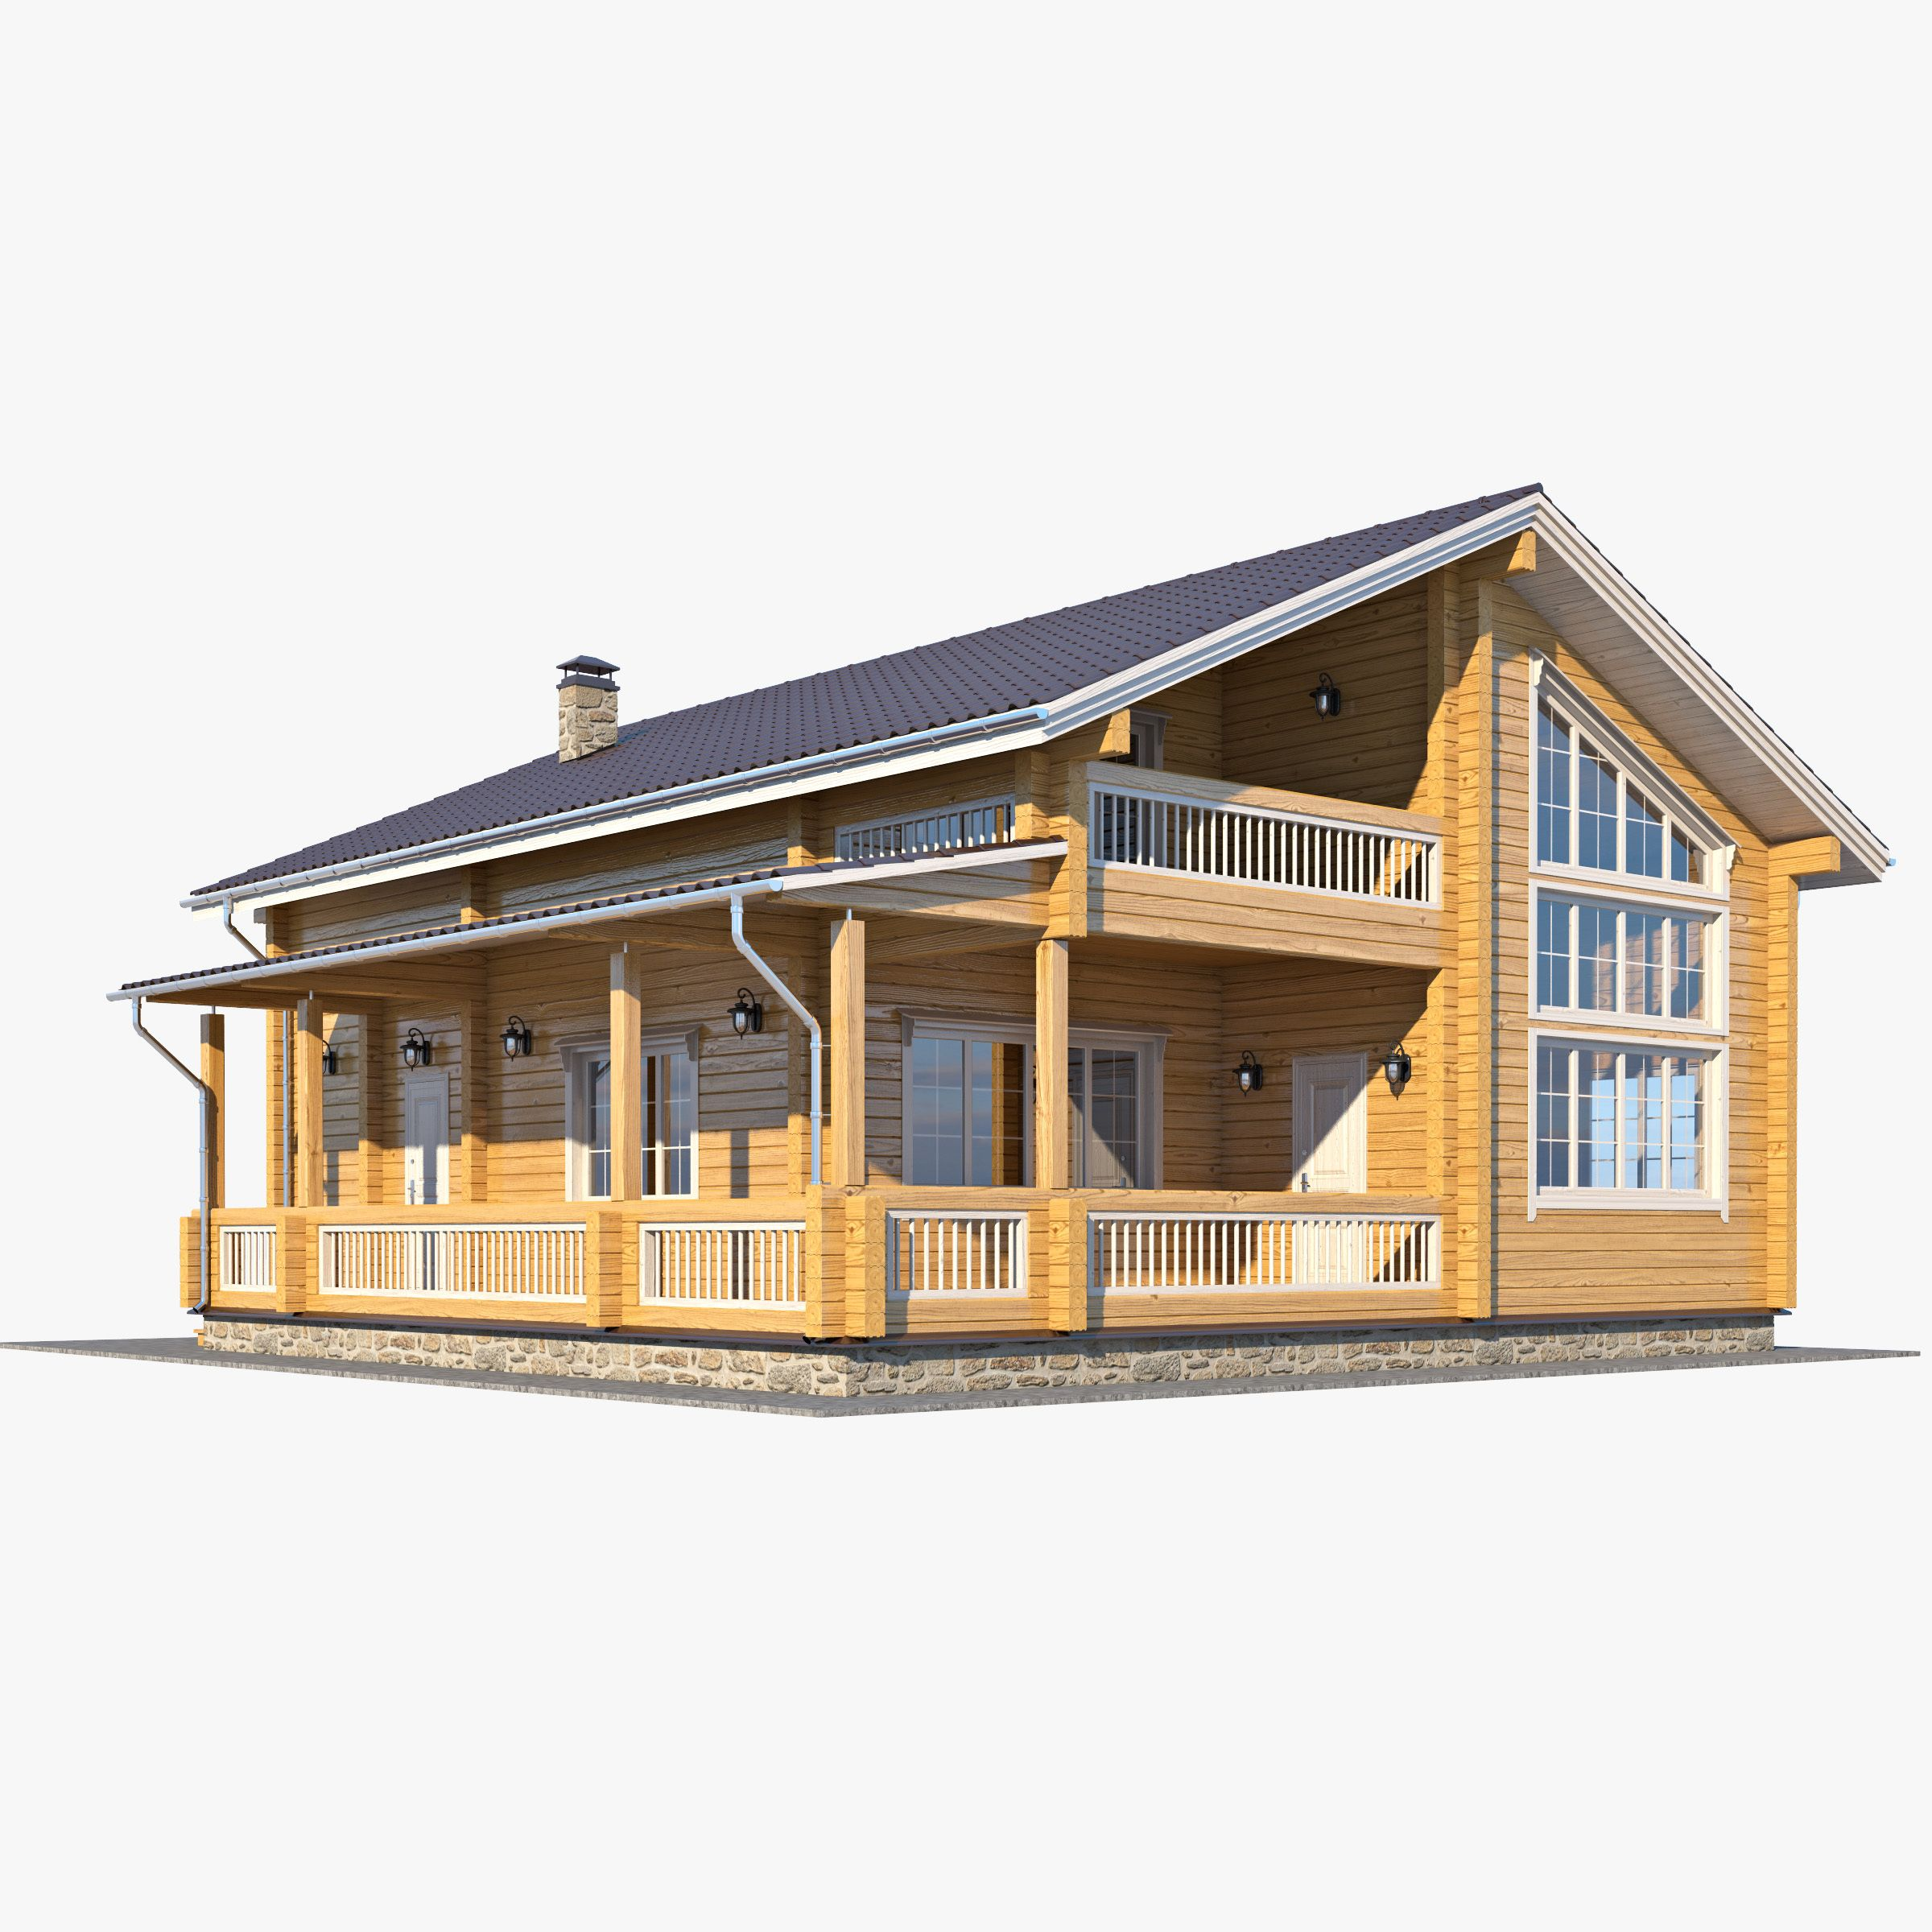 Quality Home Exteriors: Log Homes, House 3d Model, House